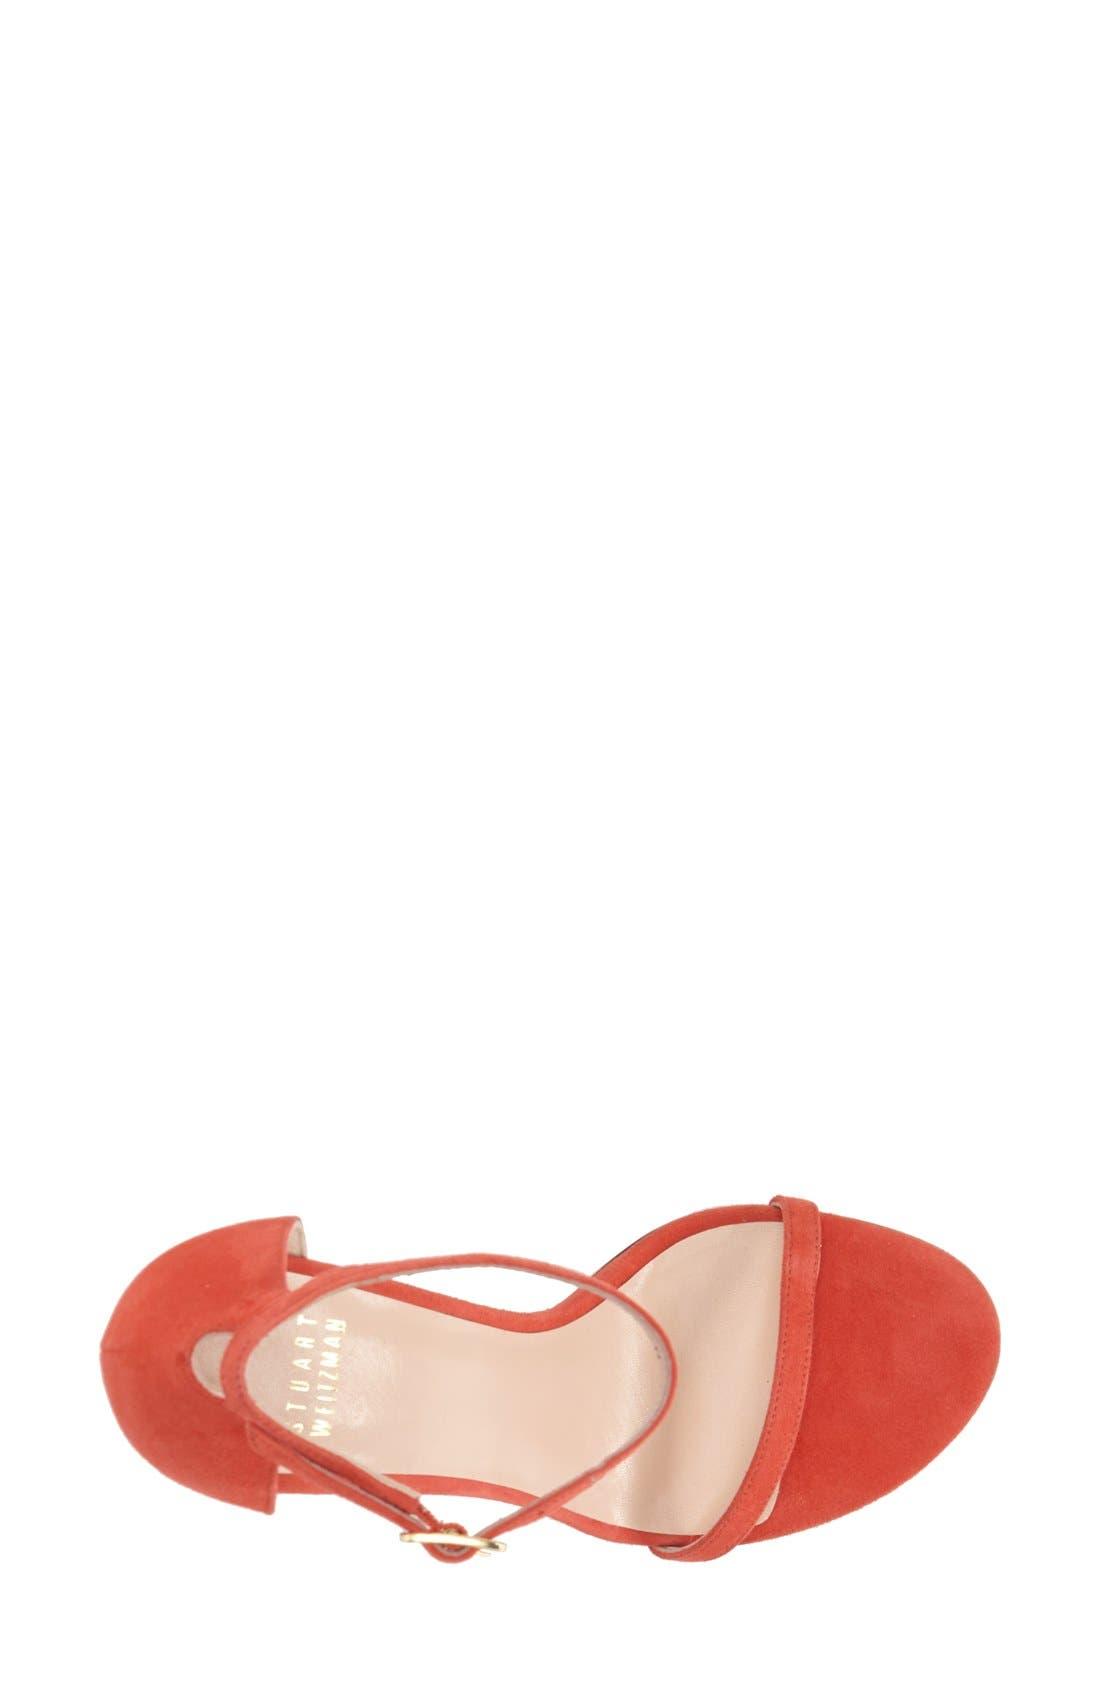 Nudistsong Ankle Strap Sandal,                             Alternate thumbnail 162, color,